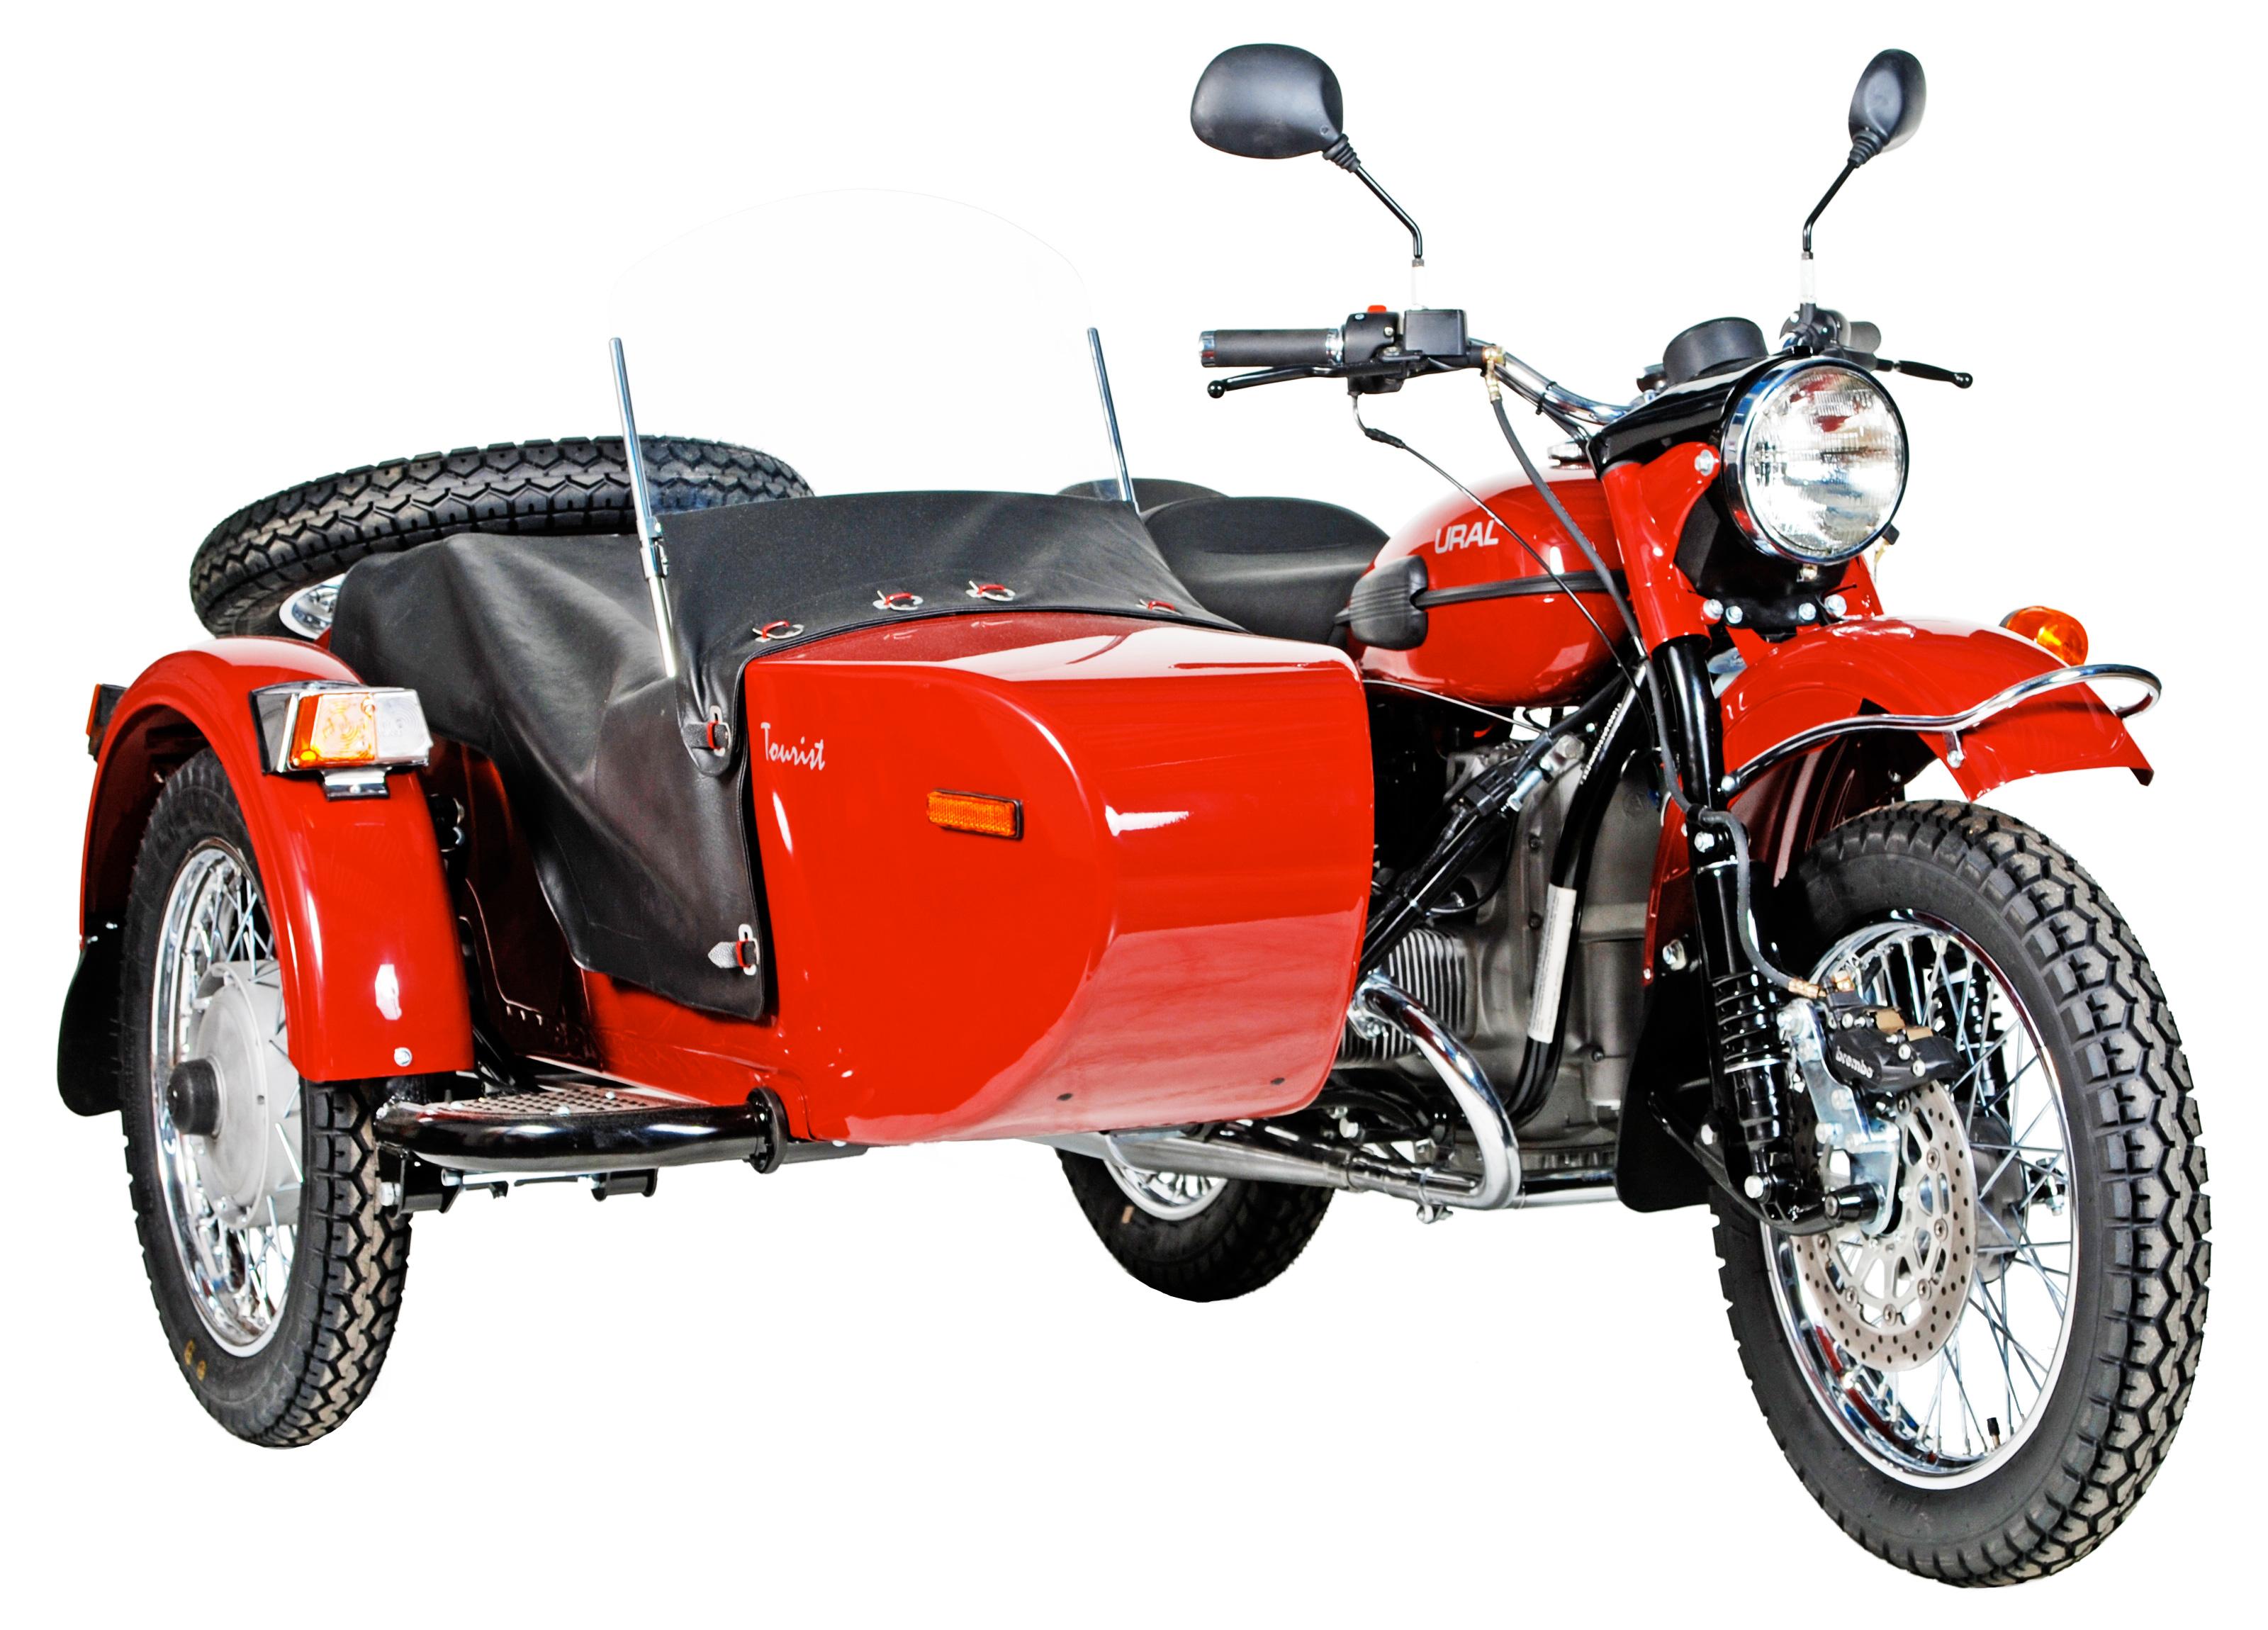 схема электрооборудования мотоцикла урал м-66